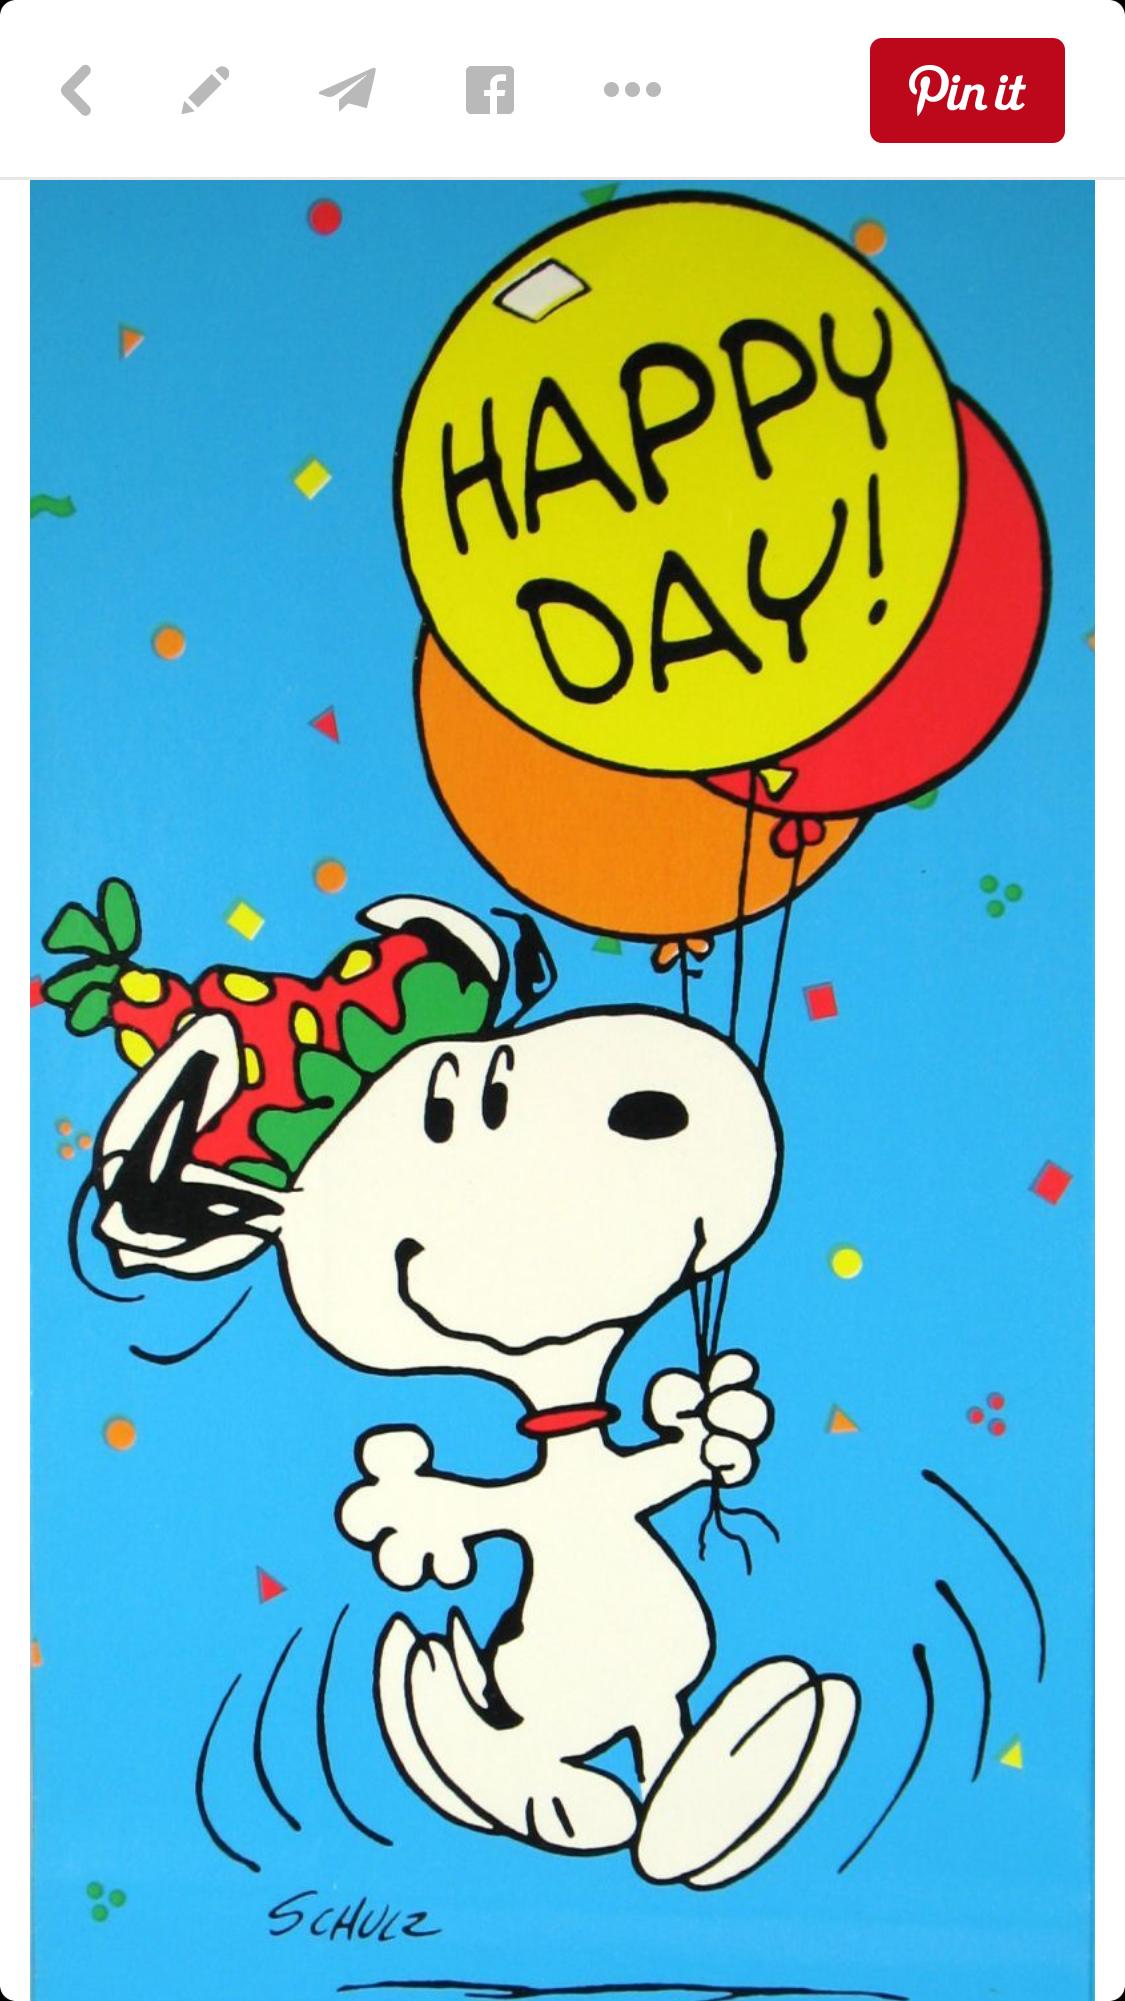 Pin by julie on printable birthday cards pinterest snoopy meme peanuts happy birthdaysnoopy birthdaybirthday cards12th birthdaypeanuts snoopycharlie brownbirthdayswoodstockpeanuts characters bookmarktalkfo Gallery